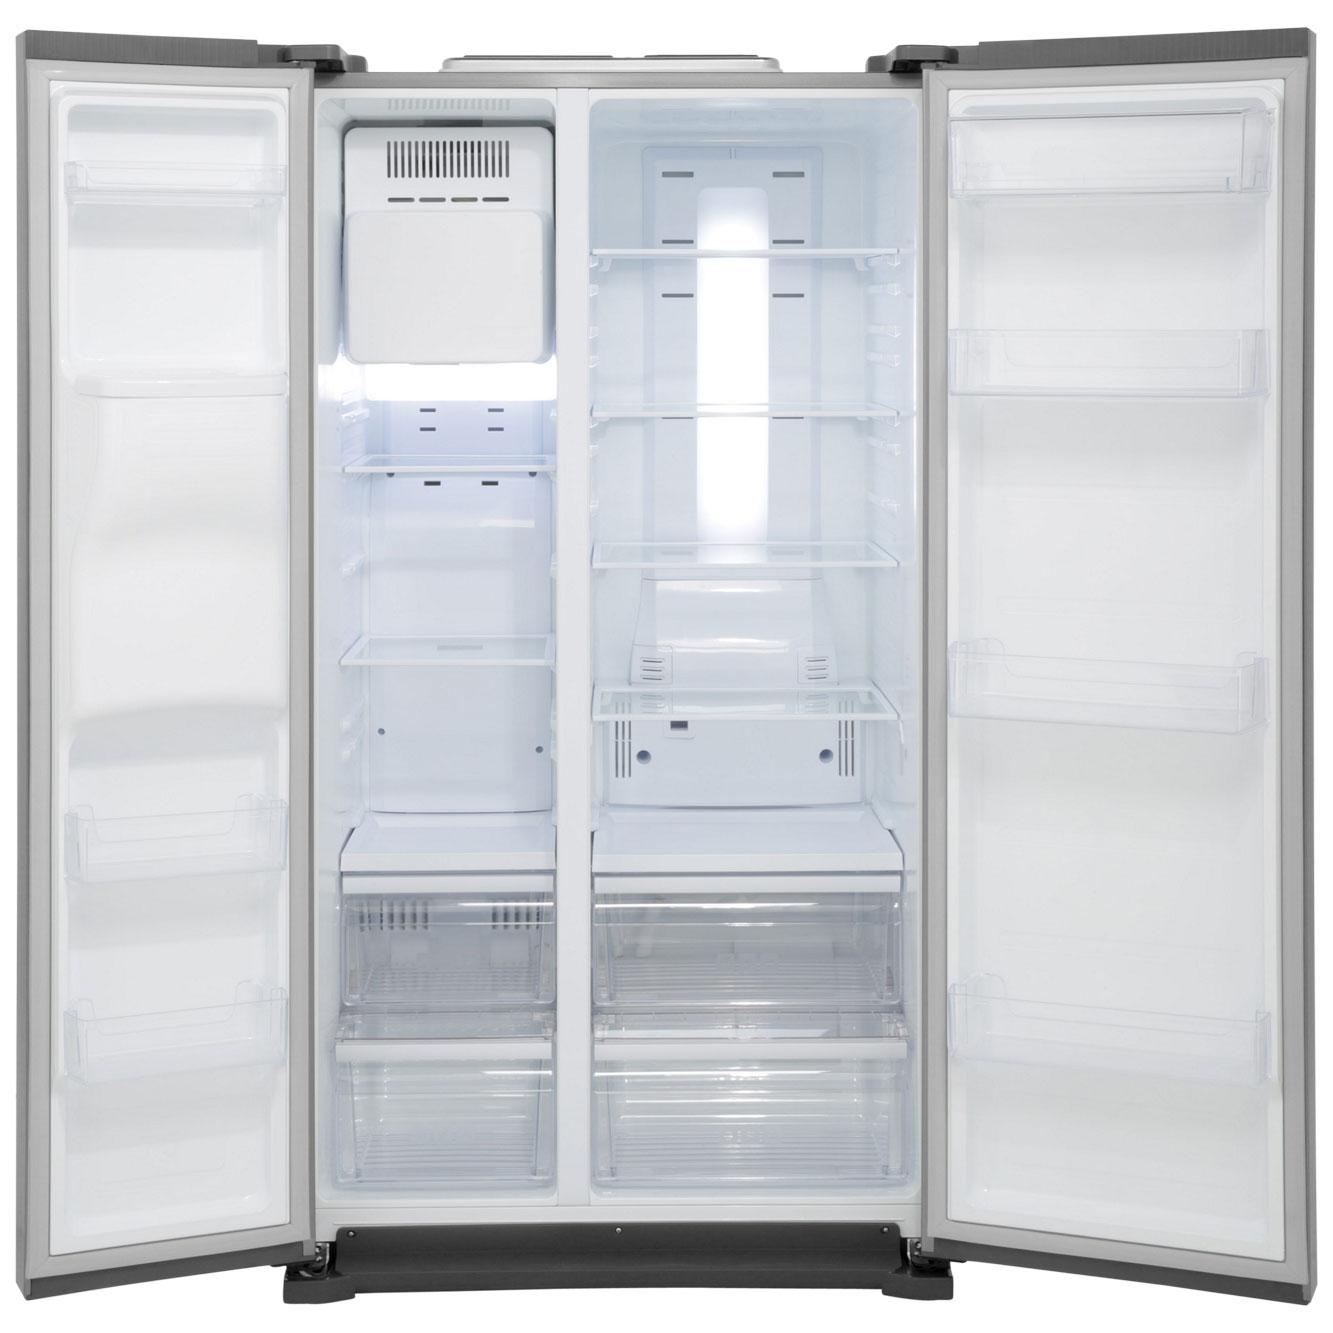 Samsung American Freezer Part - 29: Samsung H-Series RS7567BHCBC American Fridge Freezer - Black Gloss